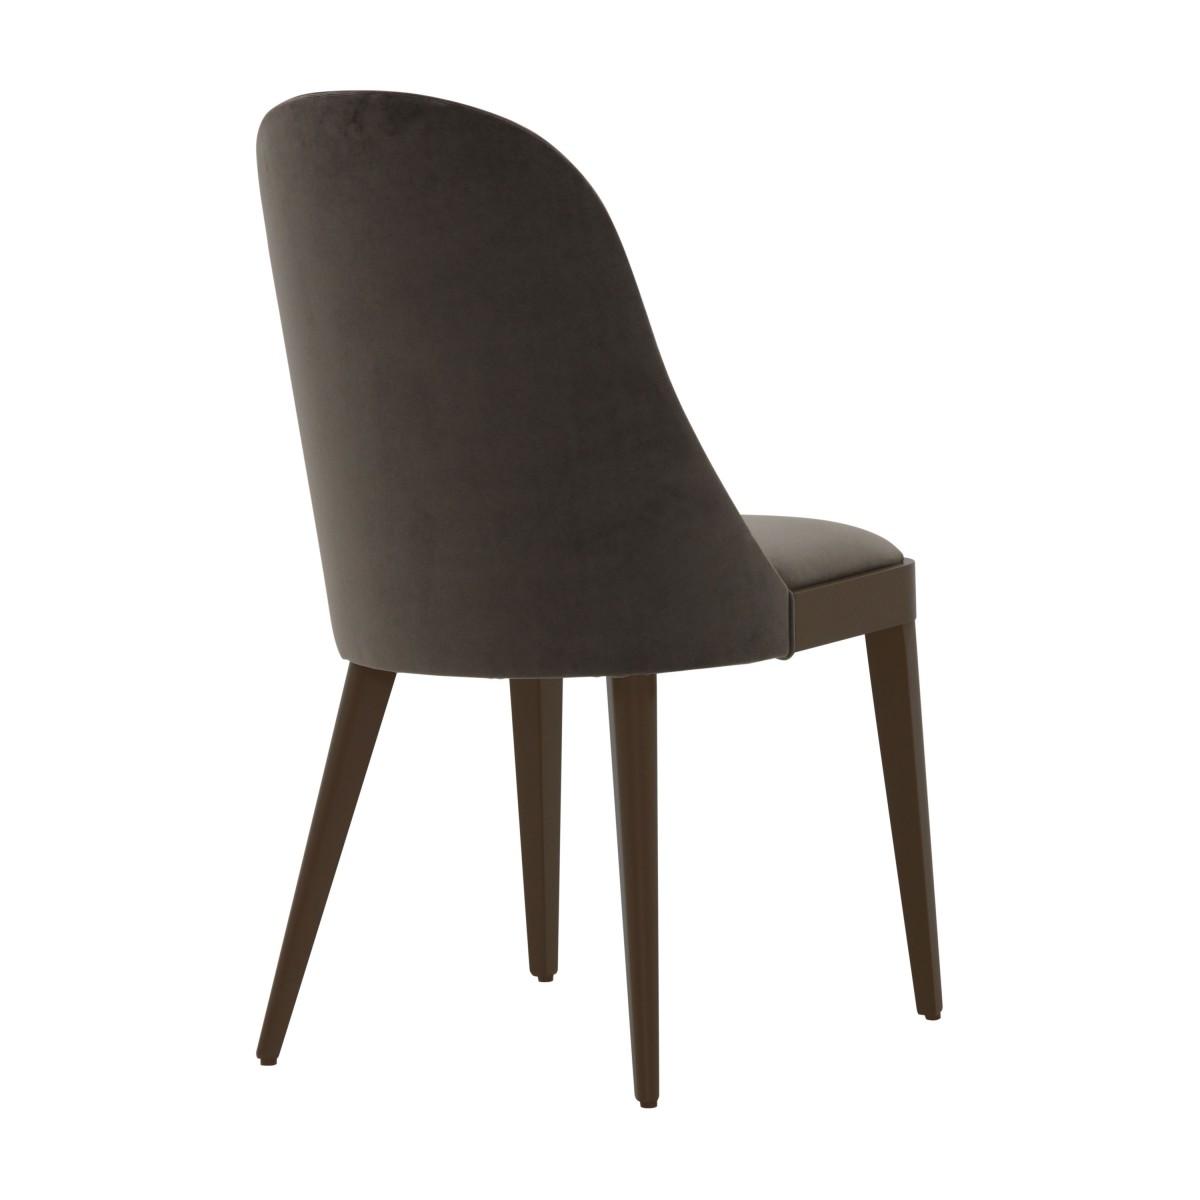 modern chair svezia 1 9818